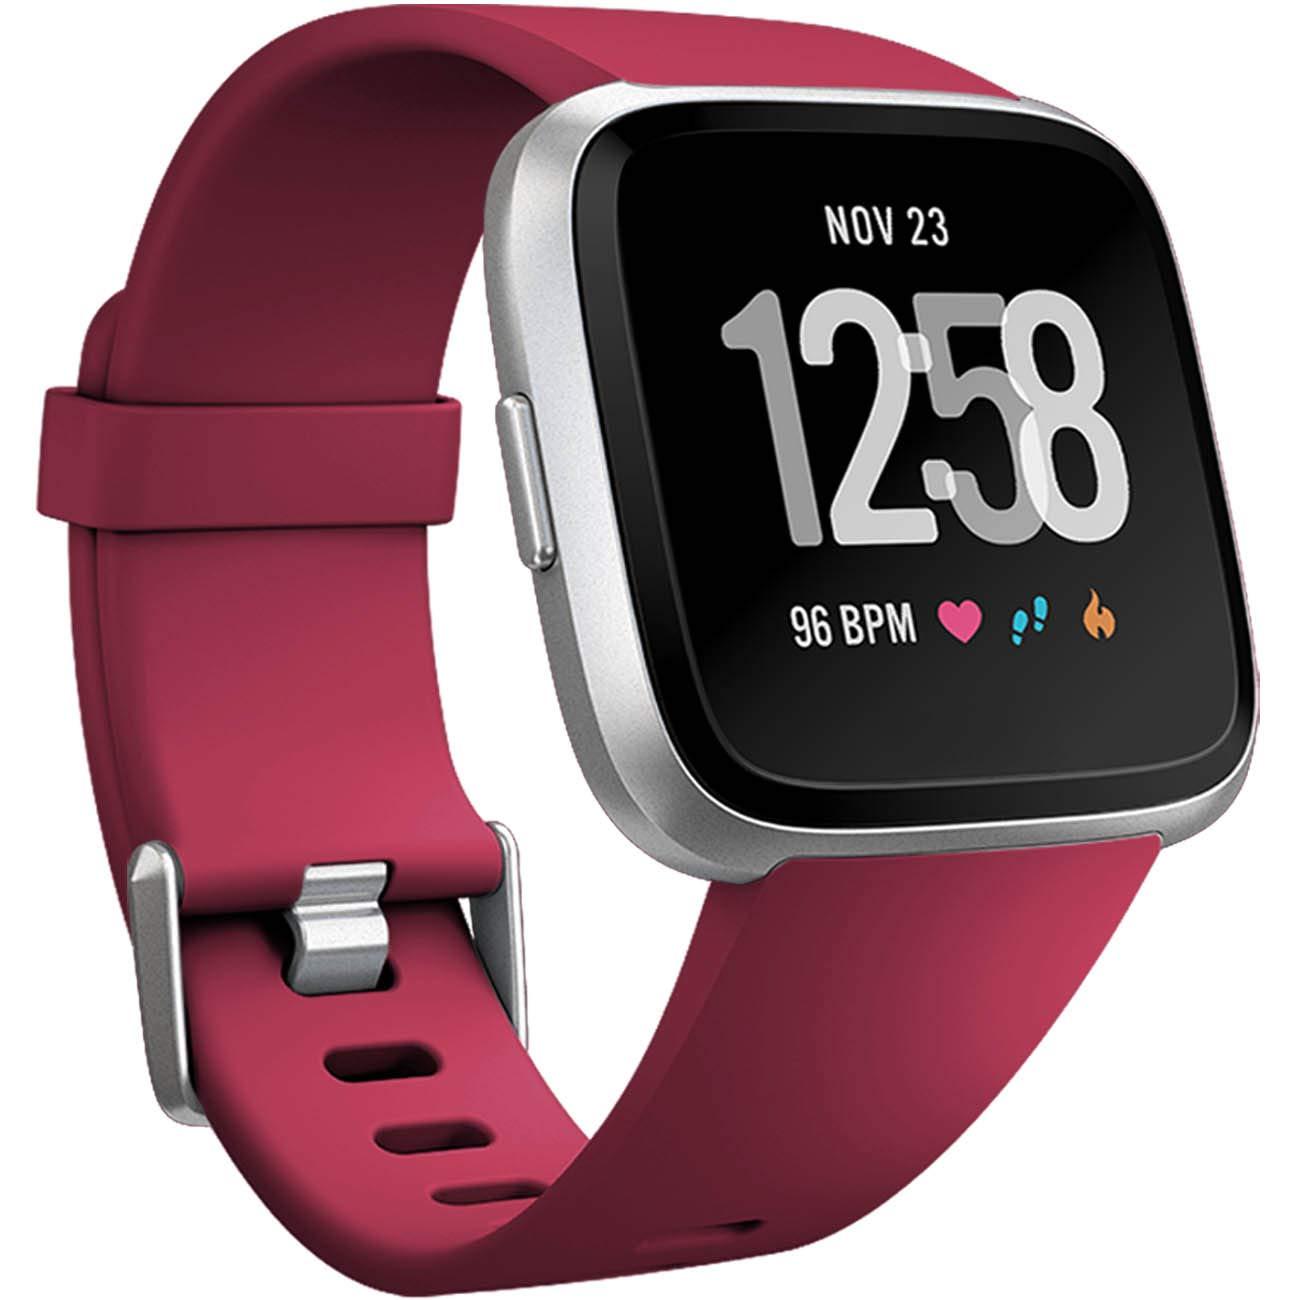 Malla Large para Fitbit Versa / Versa 2 rojo -7MK6Y5XH